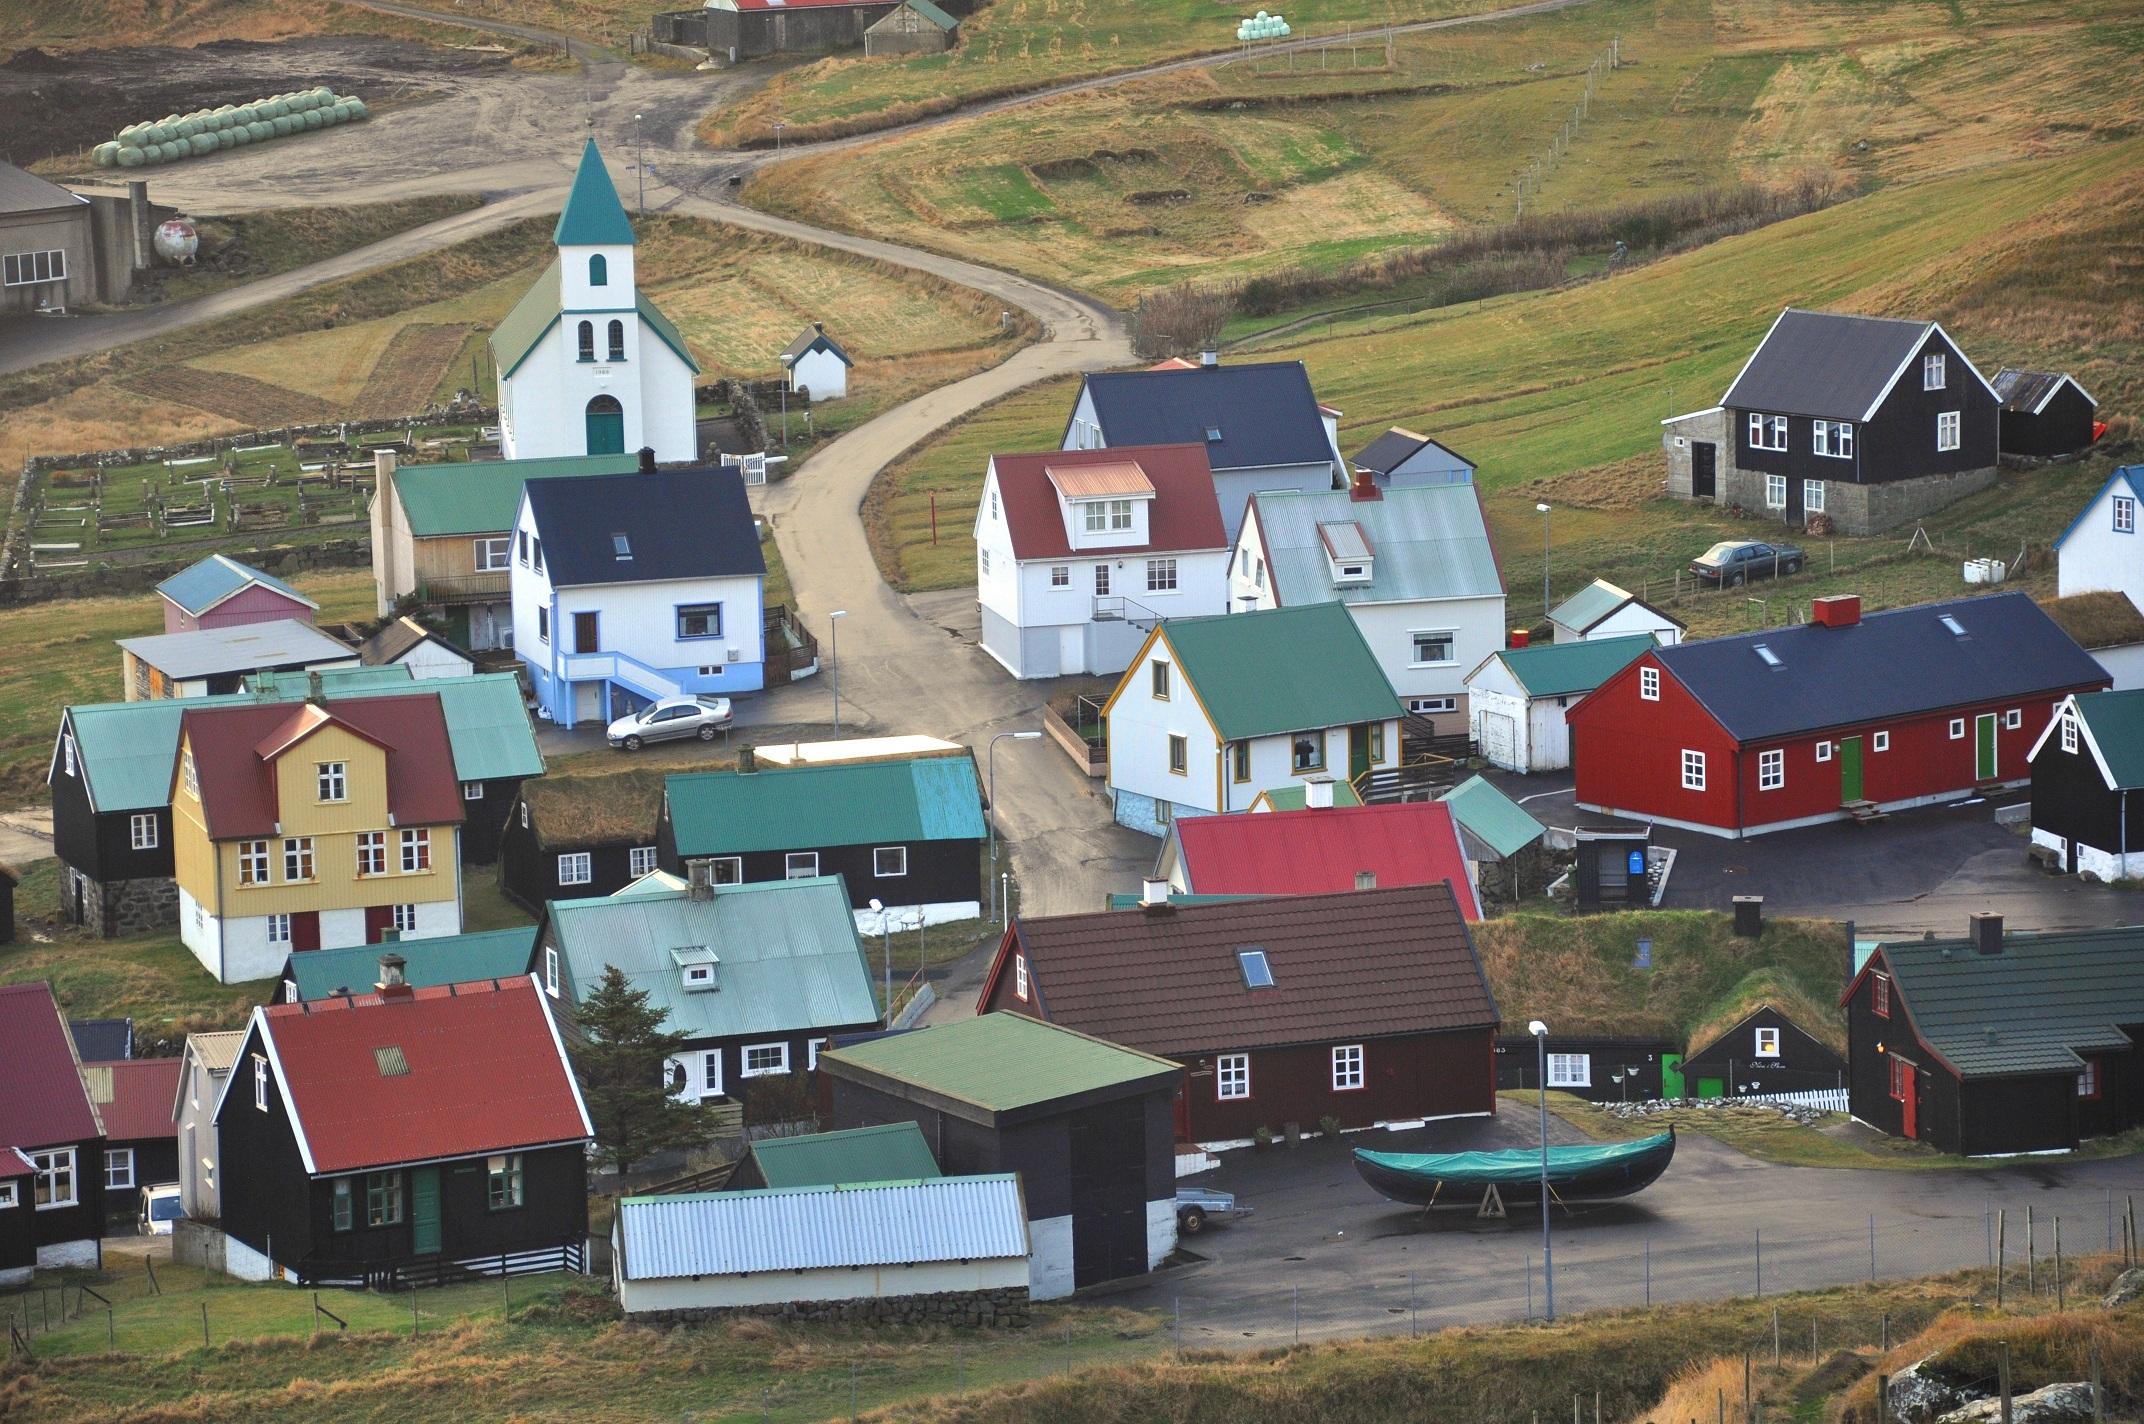 Village center of Gjógv, Faroe Islands. Photo taken on October 22, 2010.